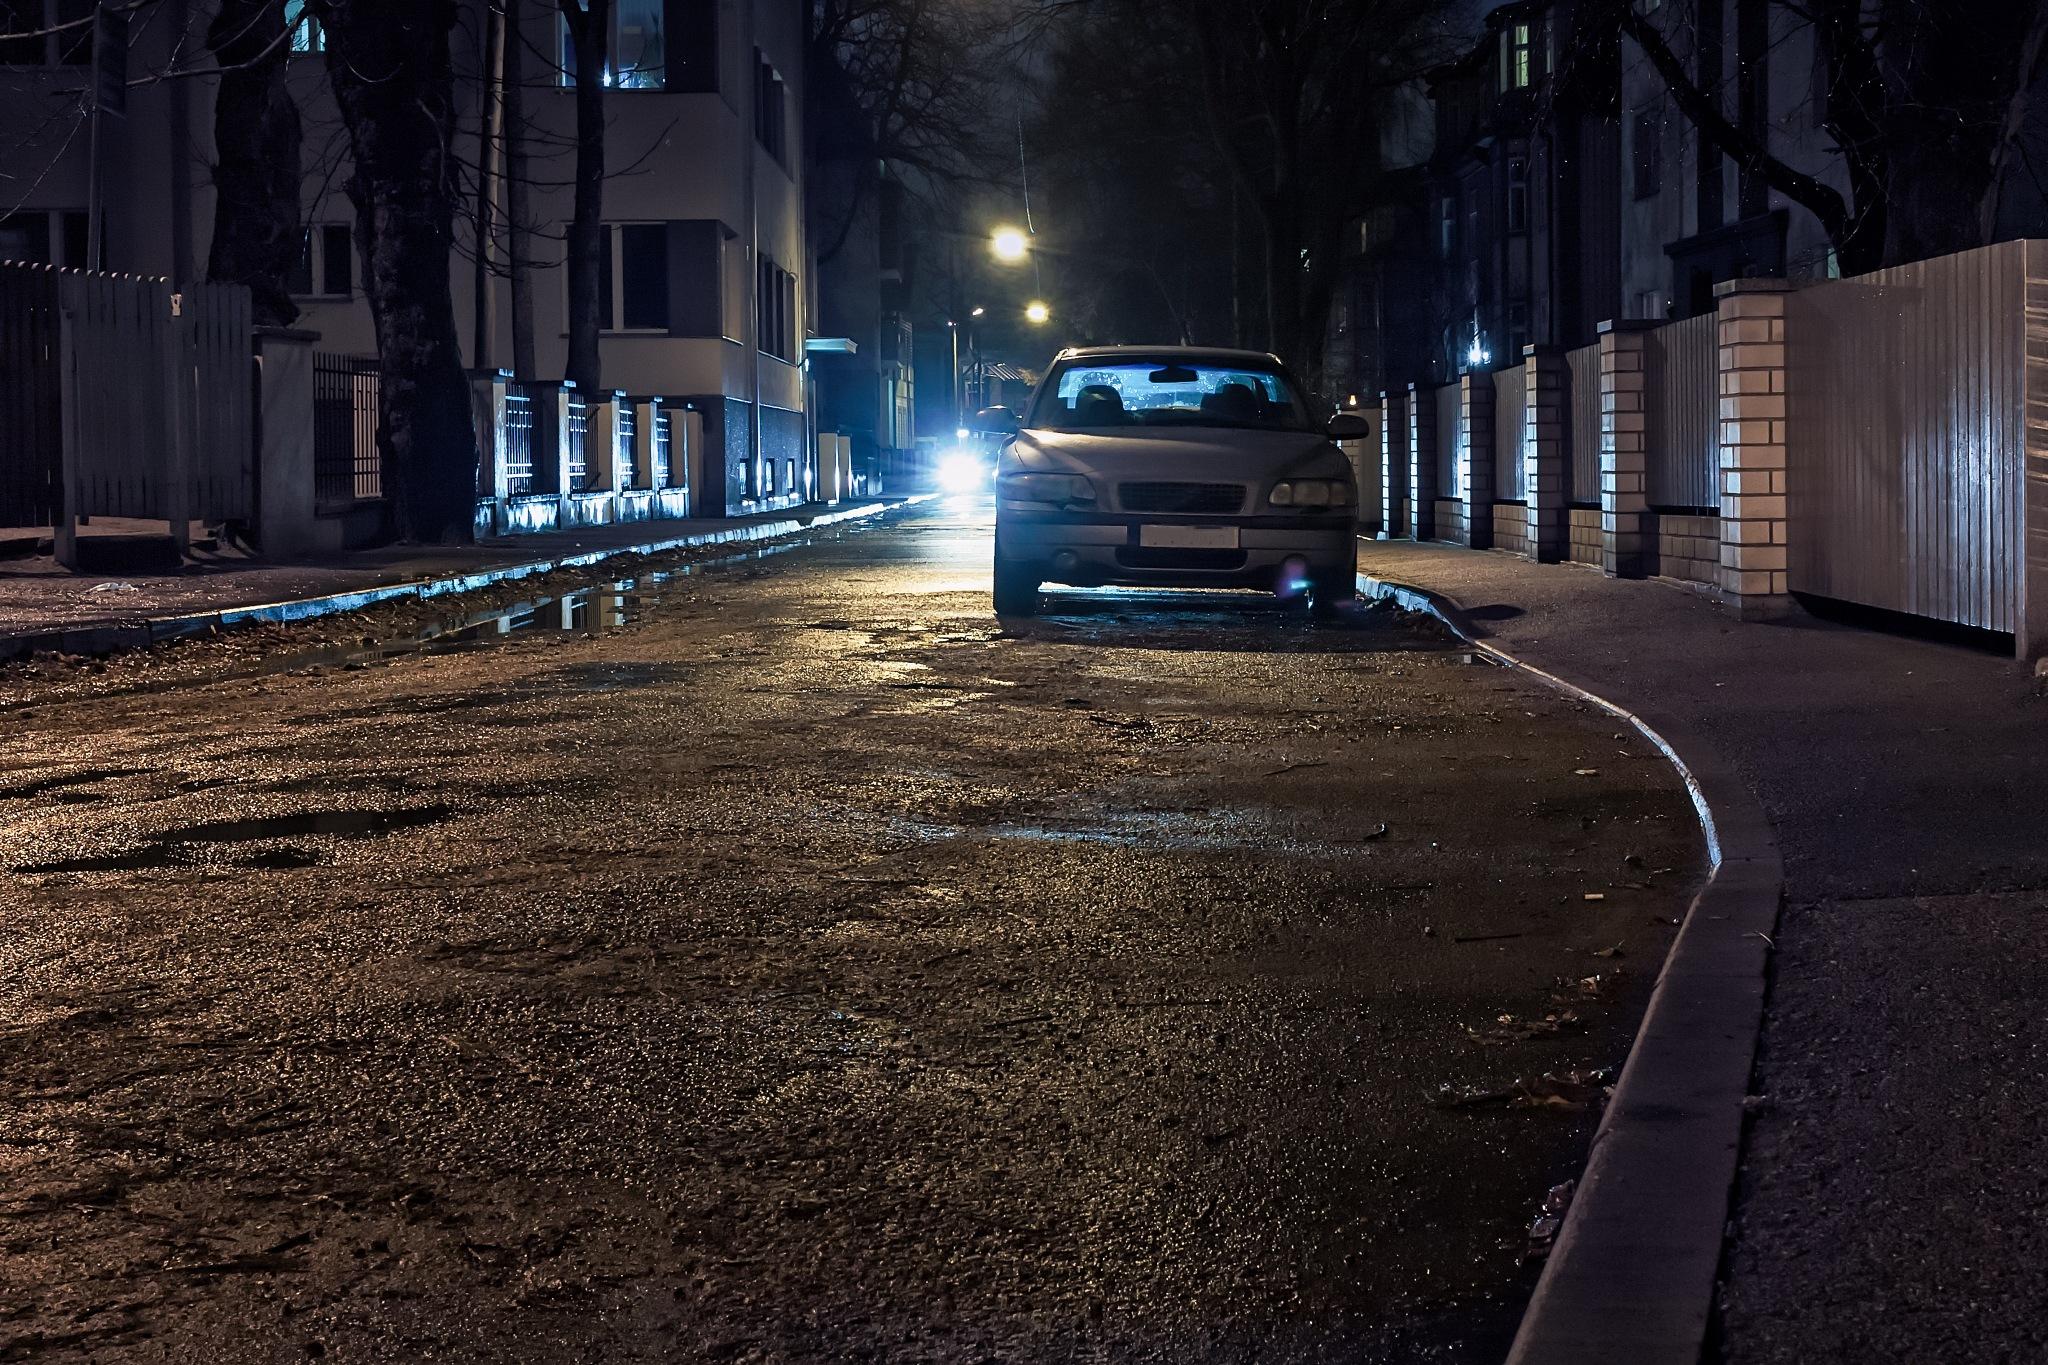 Quiet Street At Night by J.P. Heinovirta